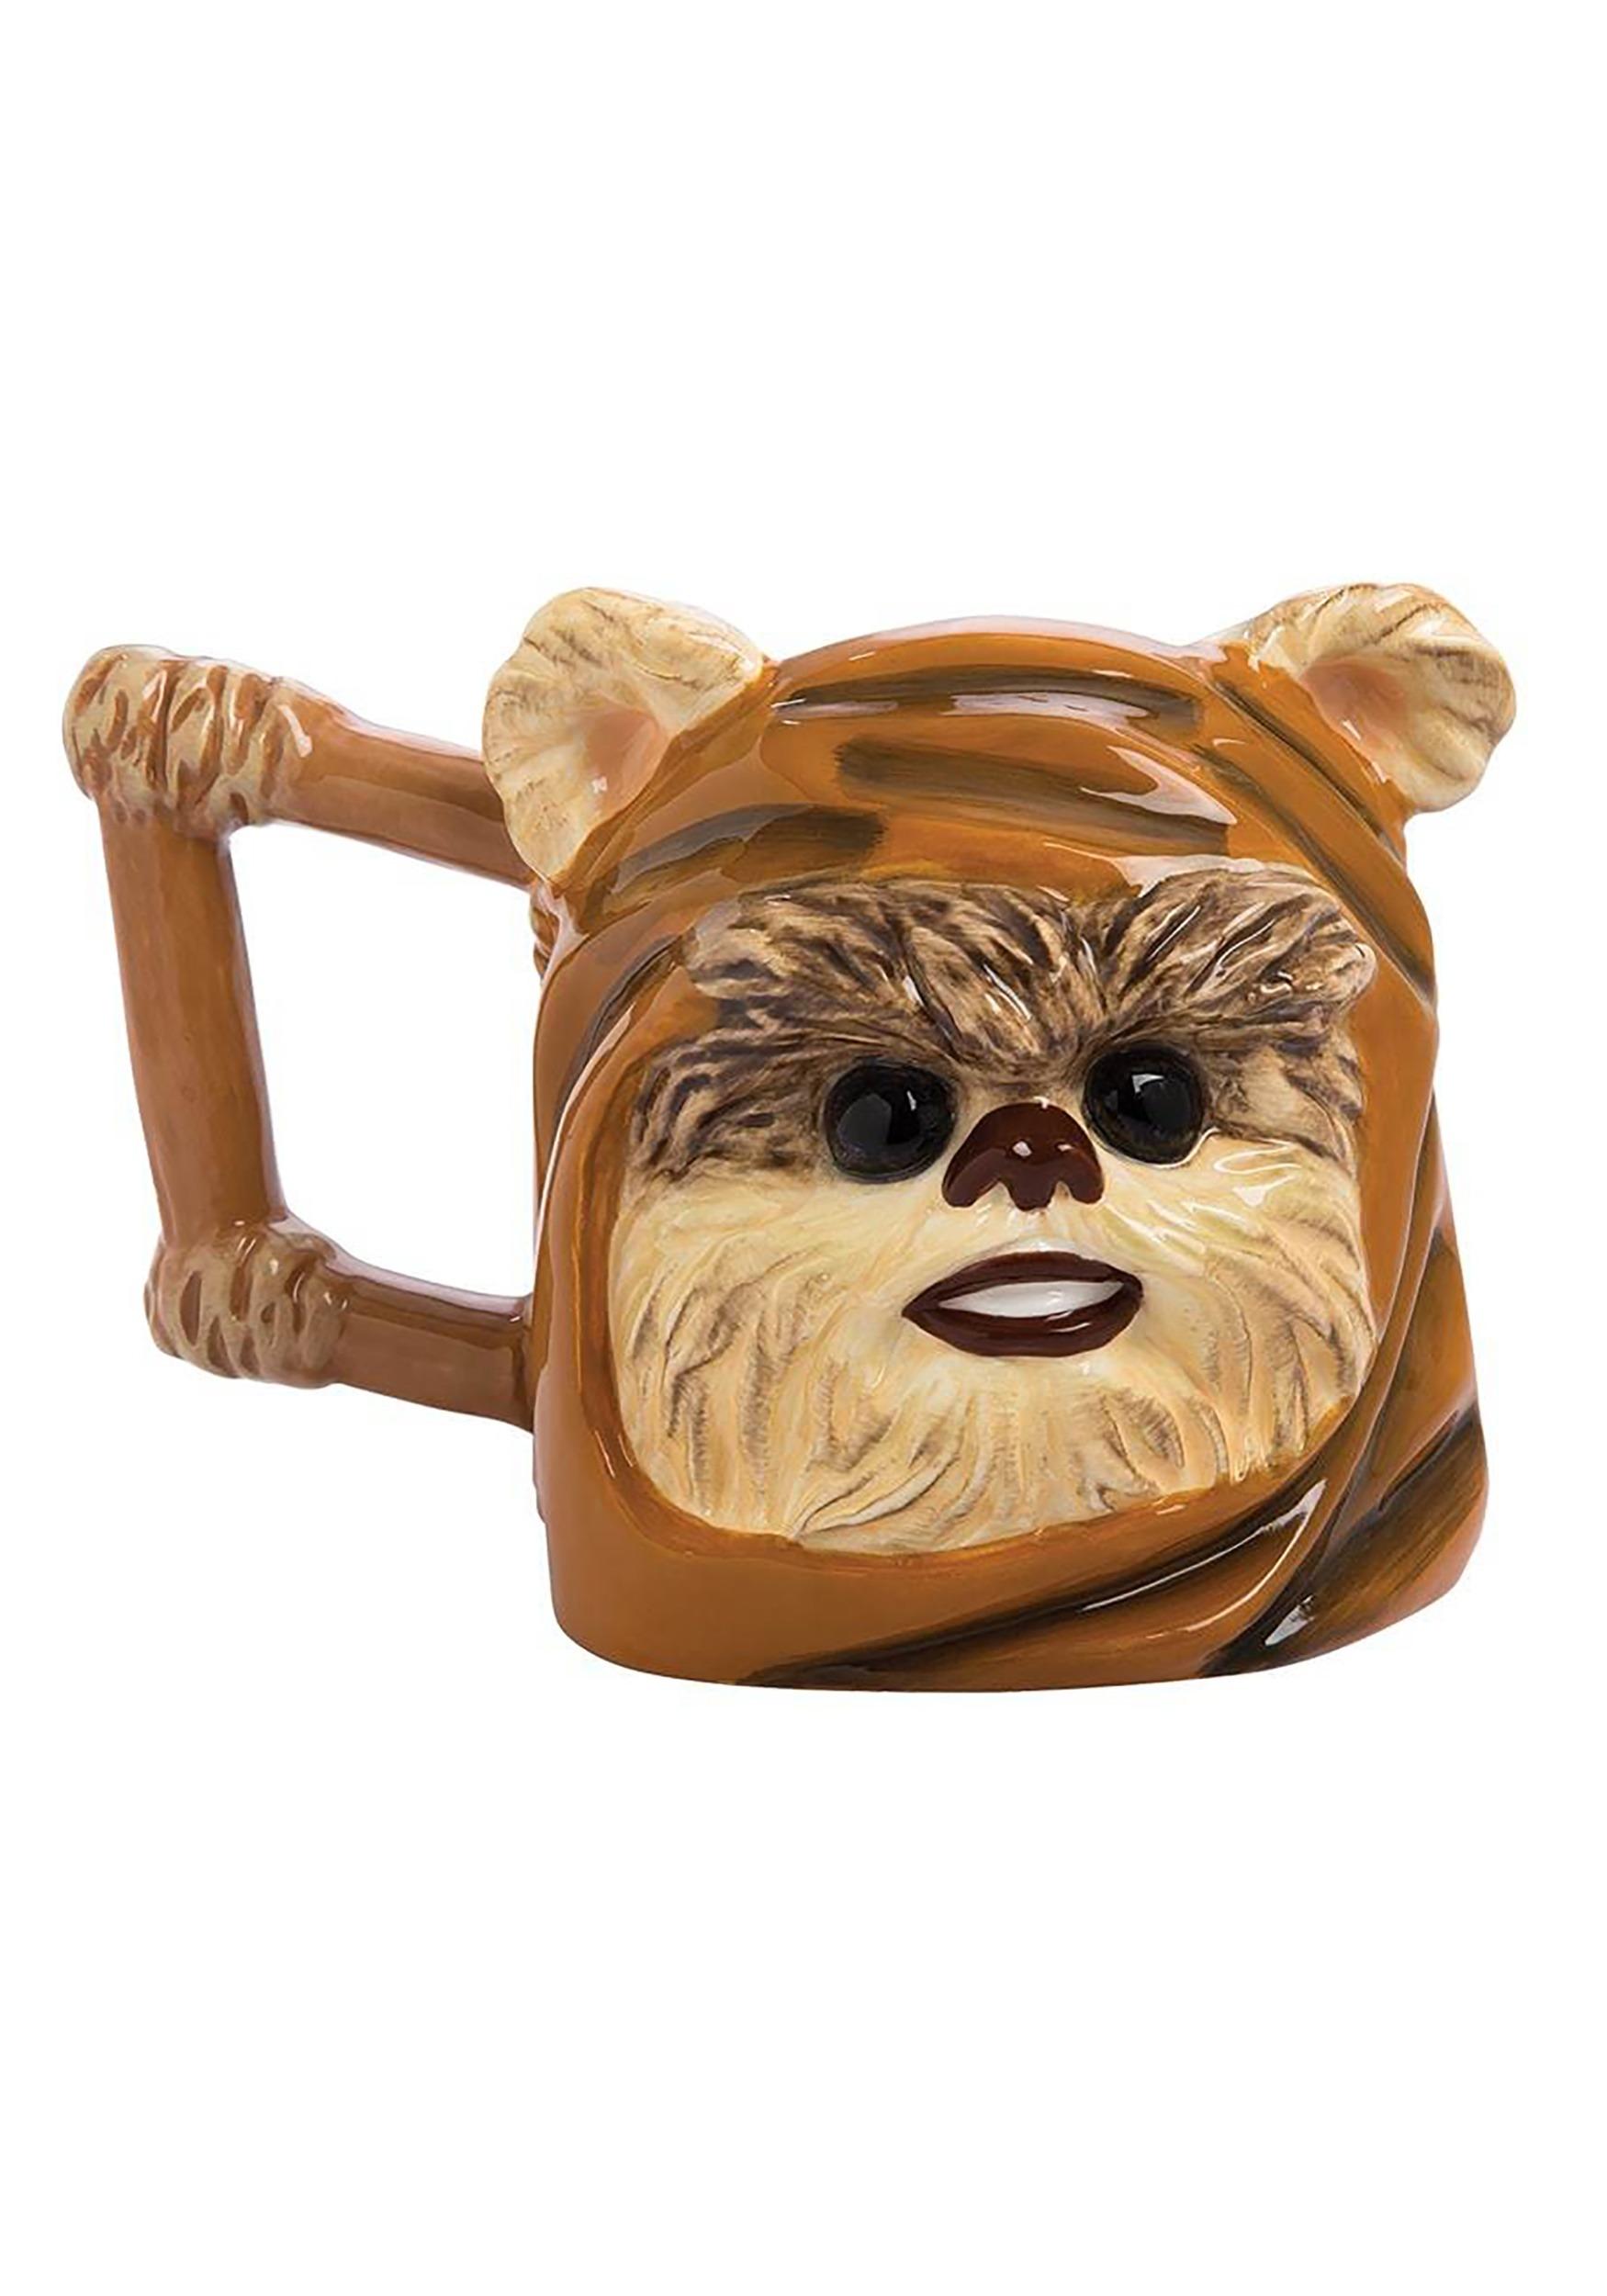 Star Wars Ewok Ceramic Sculpted 24 oz Mug